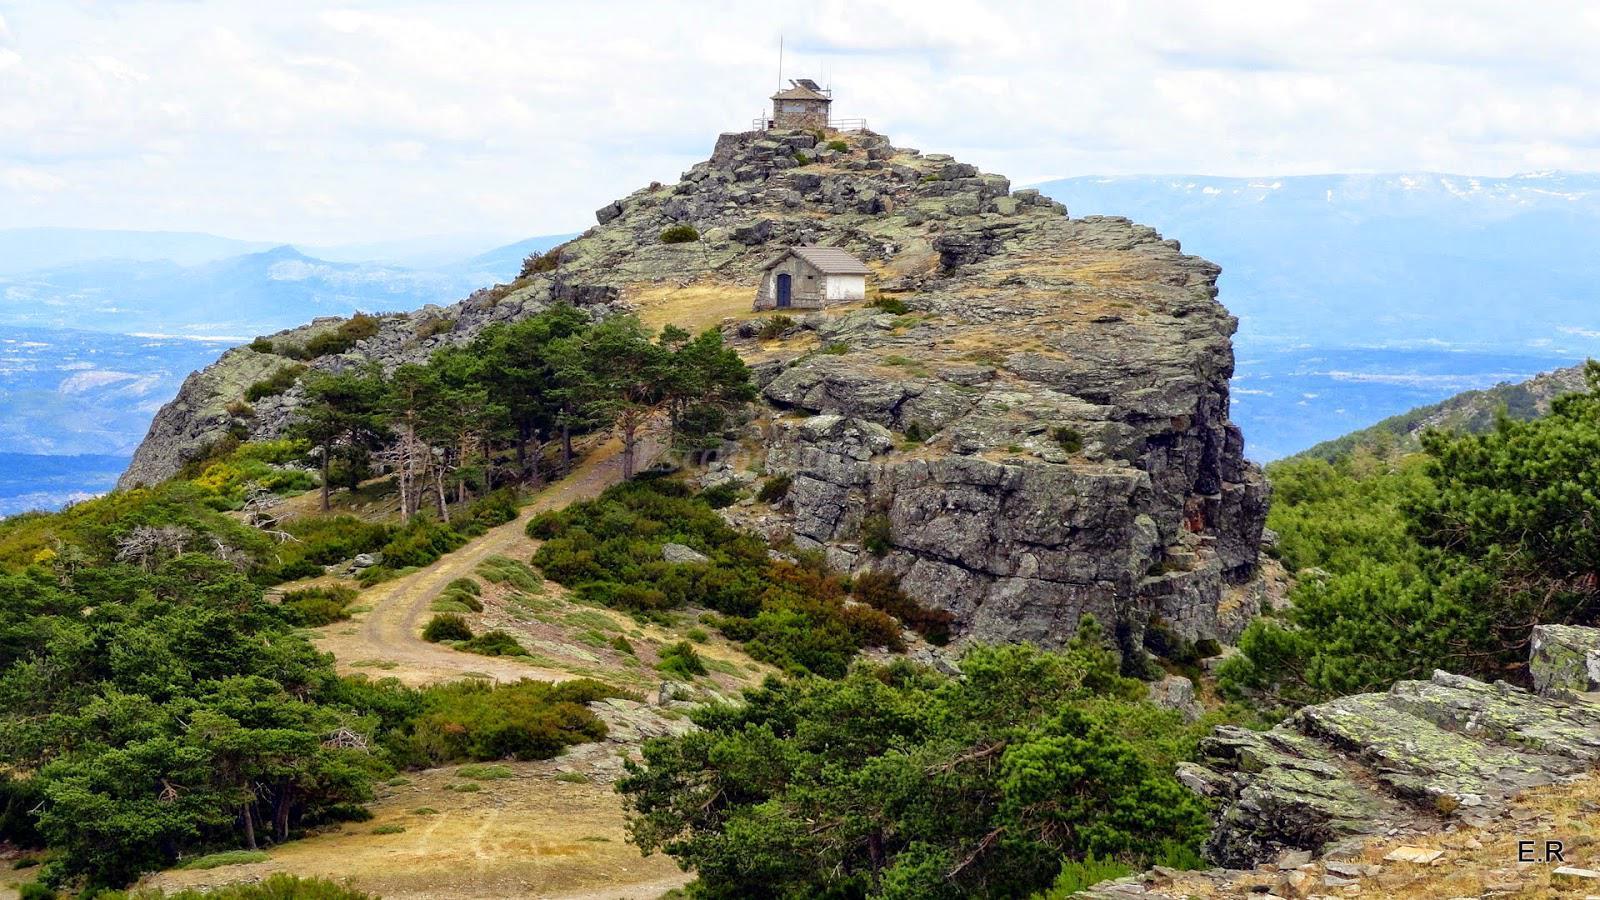 Fotos de castellana casa rural en villanueva del conde salamanca - Casa rural villanueva del conde ...